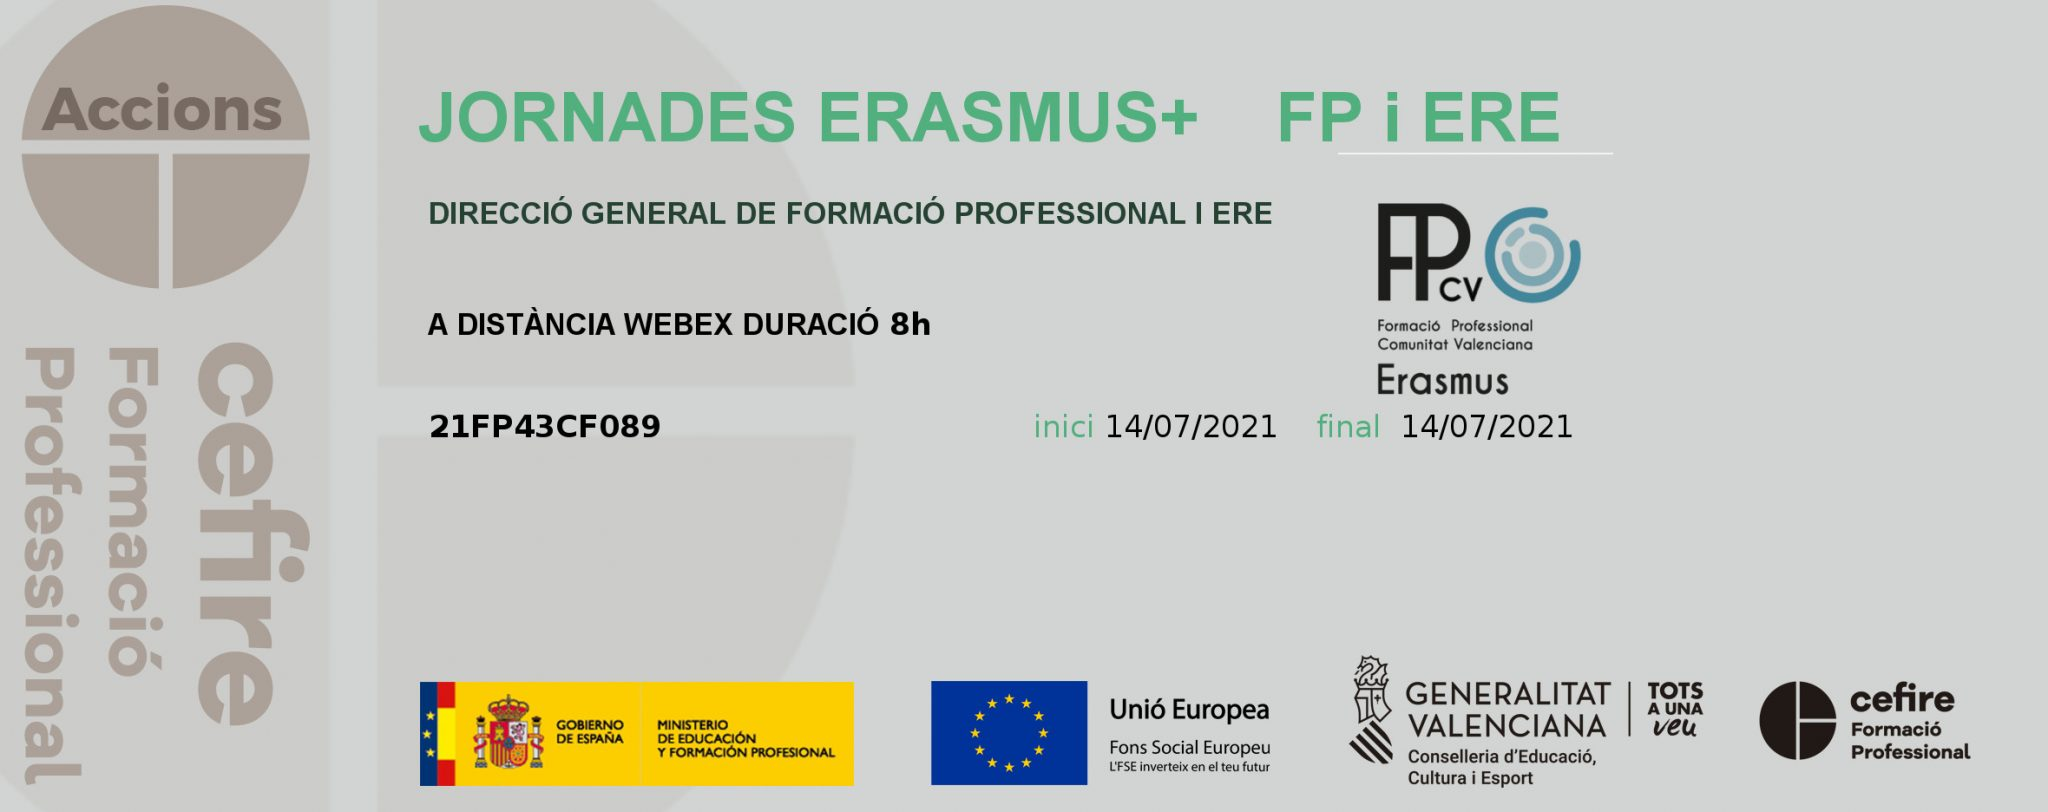 JORNADAS ERASMUS val